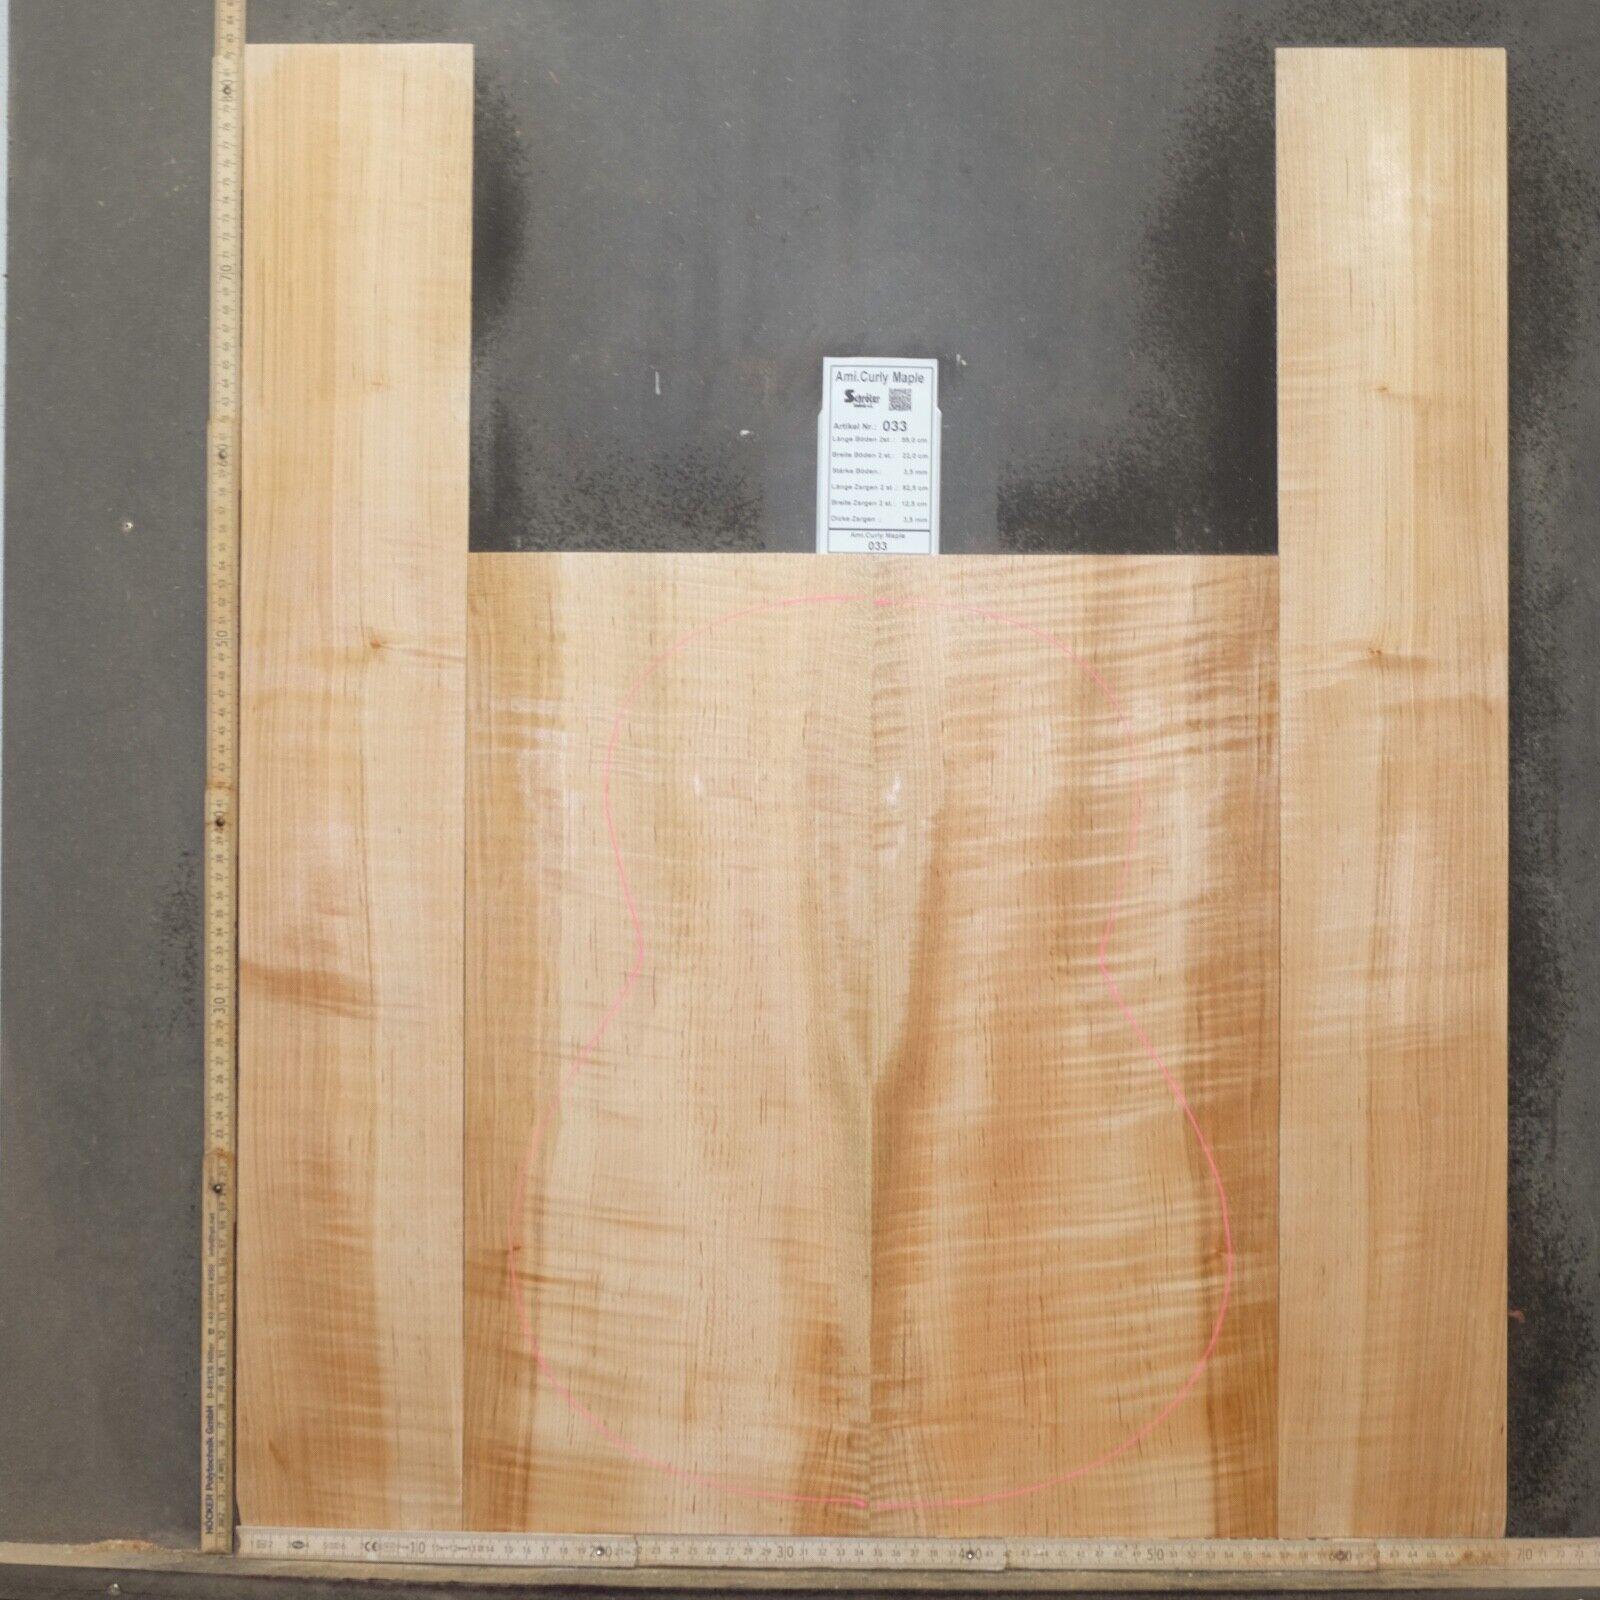 Tonewood Ami Curly Maple Ahorn Guitar Luthier Tonholz Acoustic backs & side 033